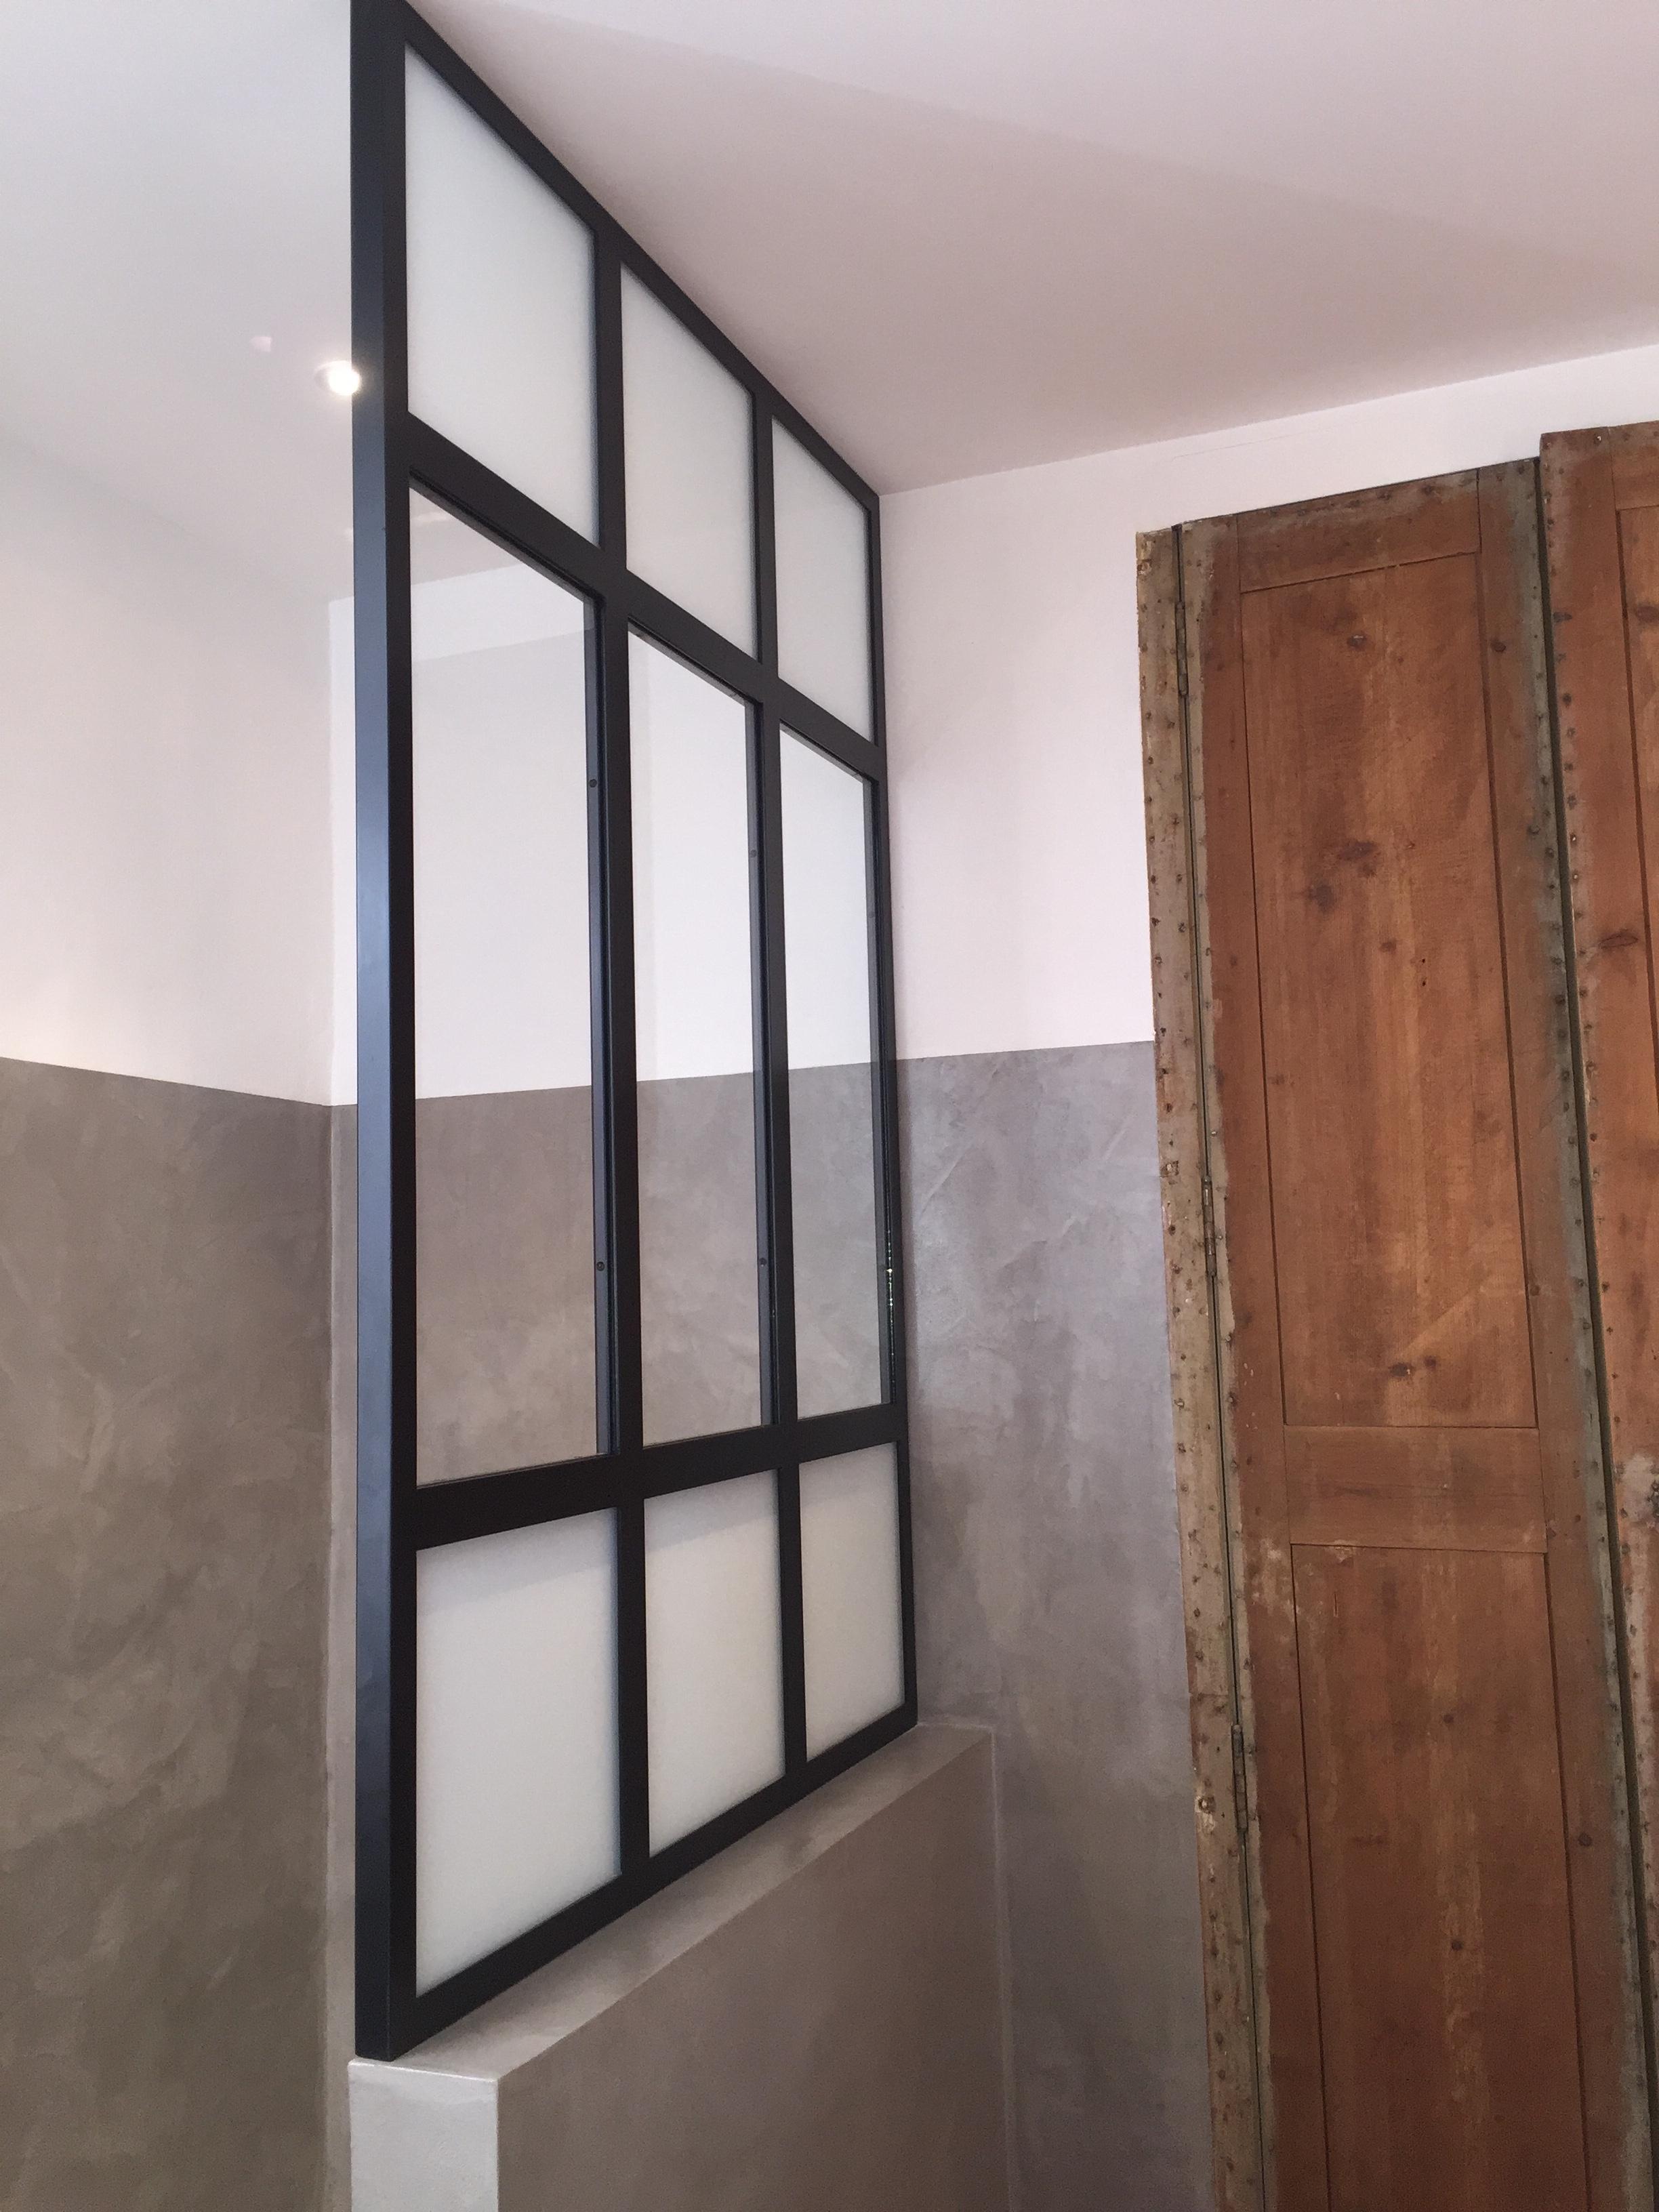 verri re salle de bain nimes vente verri re sur mesure. Black Bedroom Furniture Sets. Home Design Ideas